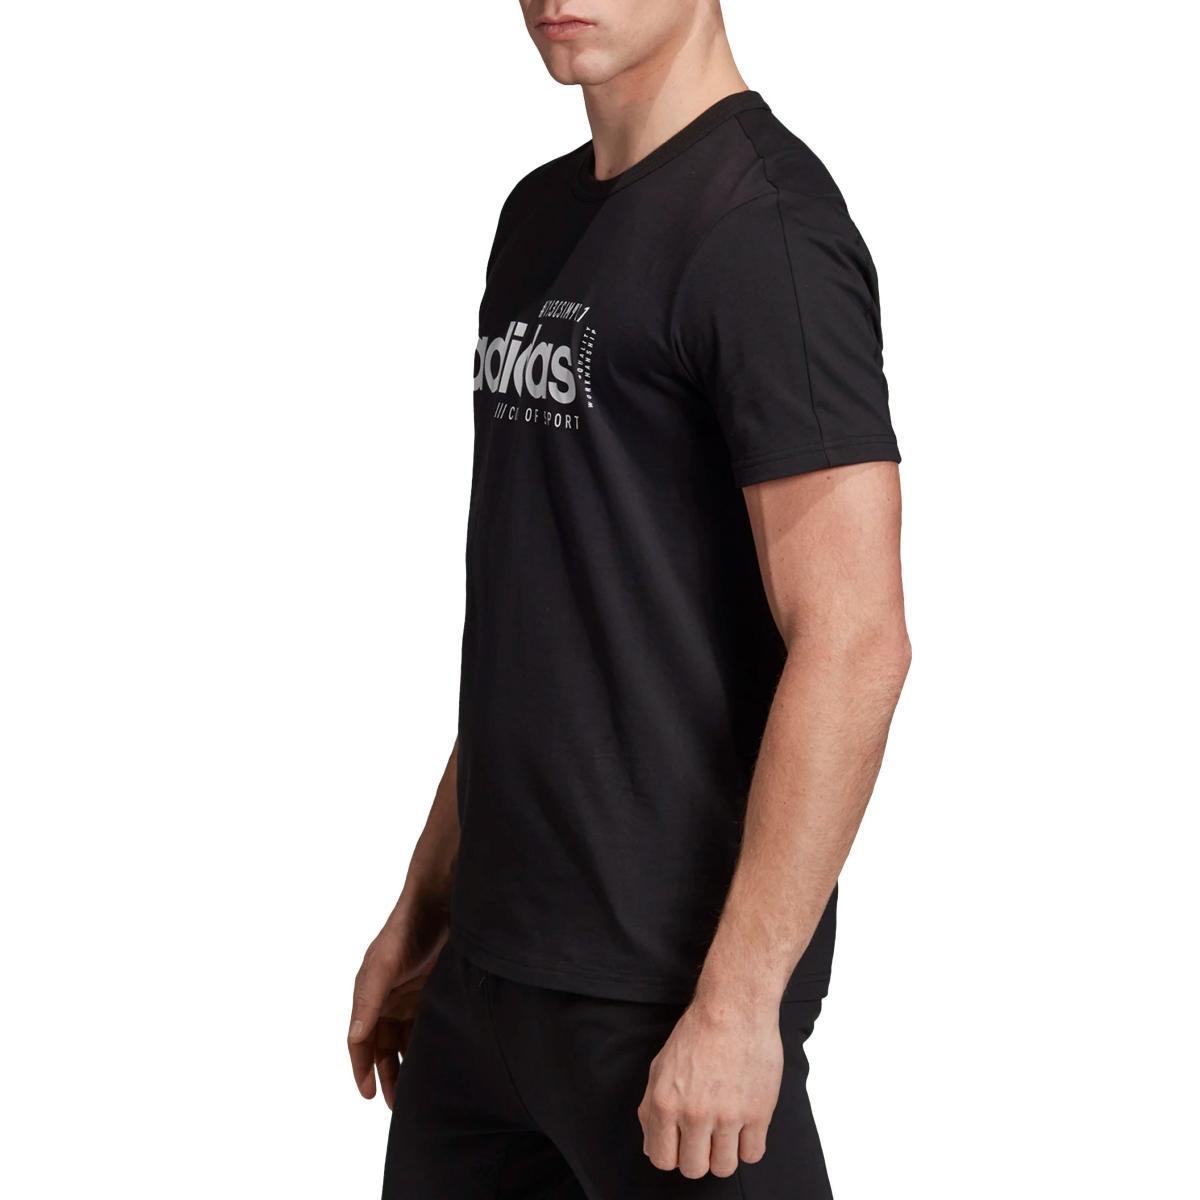 T-shirt Adidas Brilliant Basics da uomo rif. EI4623